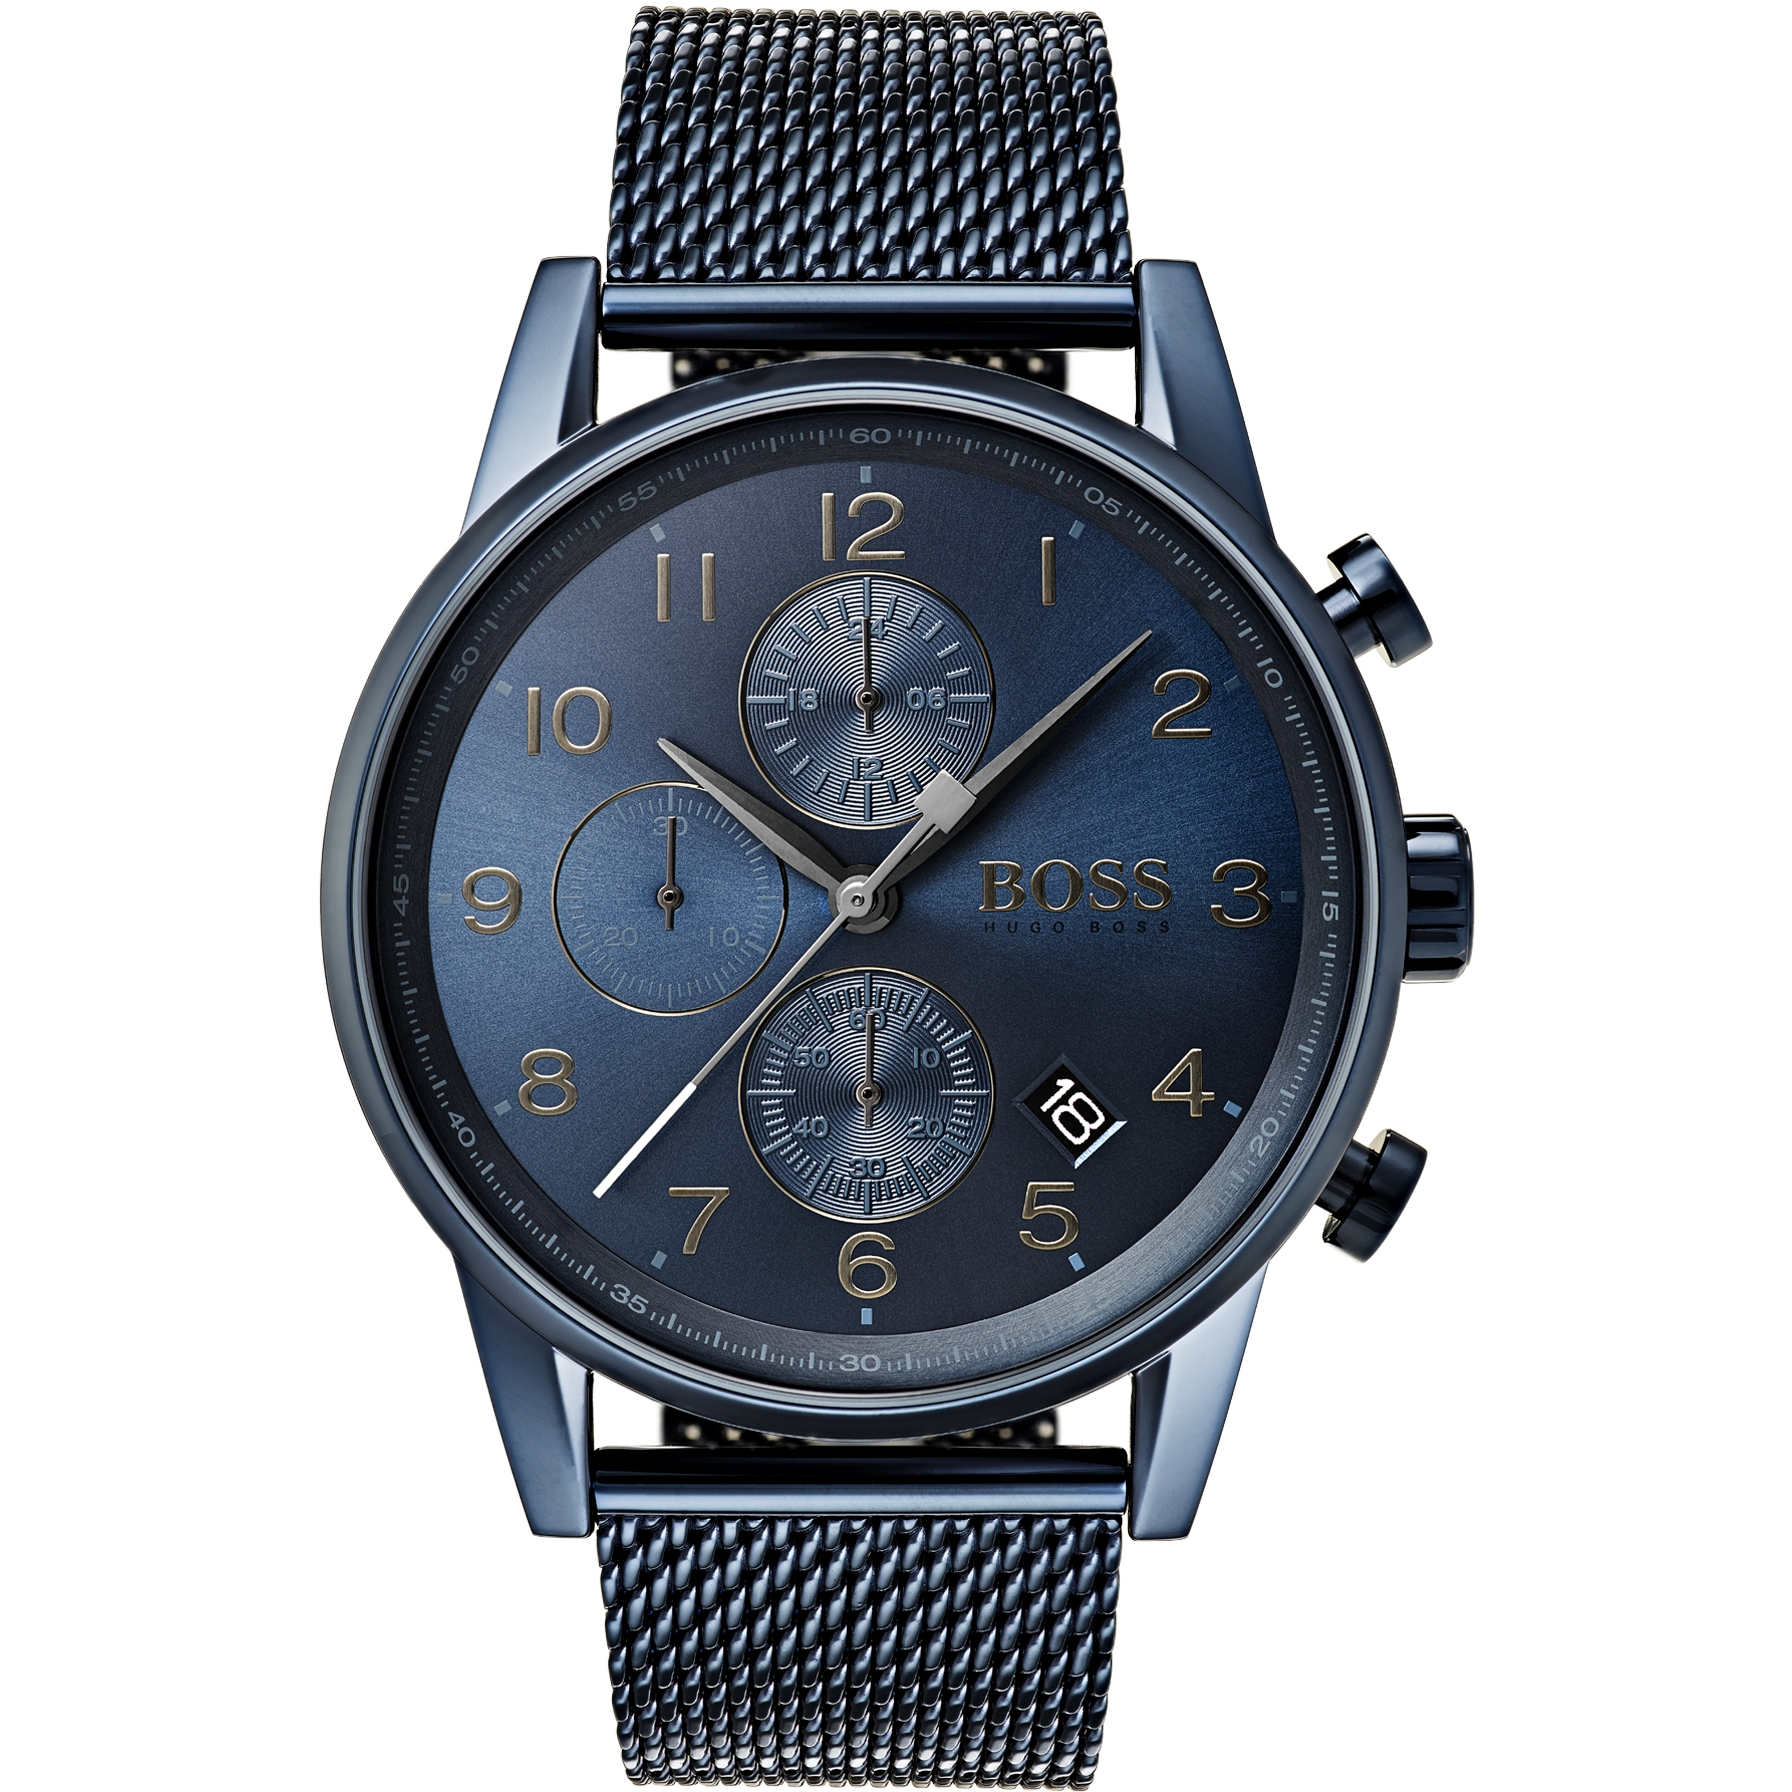 Gents Hugo Boss Navigator GQ Edition Chronograph Watch (1513538 ... d29a3854abe2